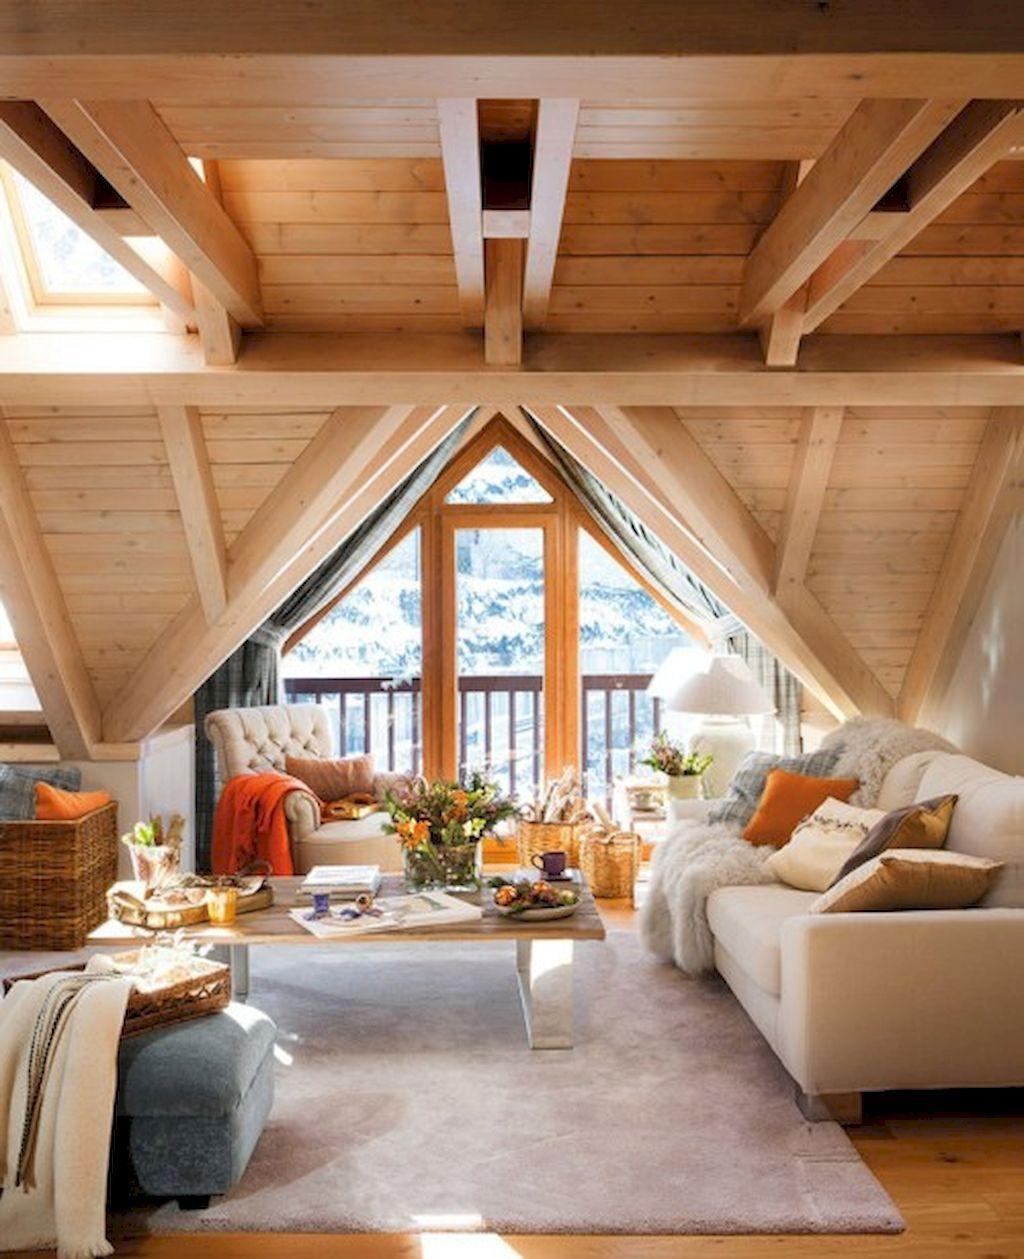 Top 30 Tiny House Interior Decor Ideas